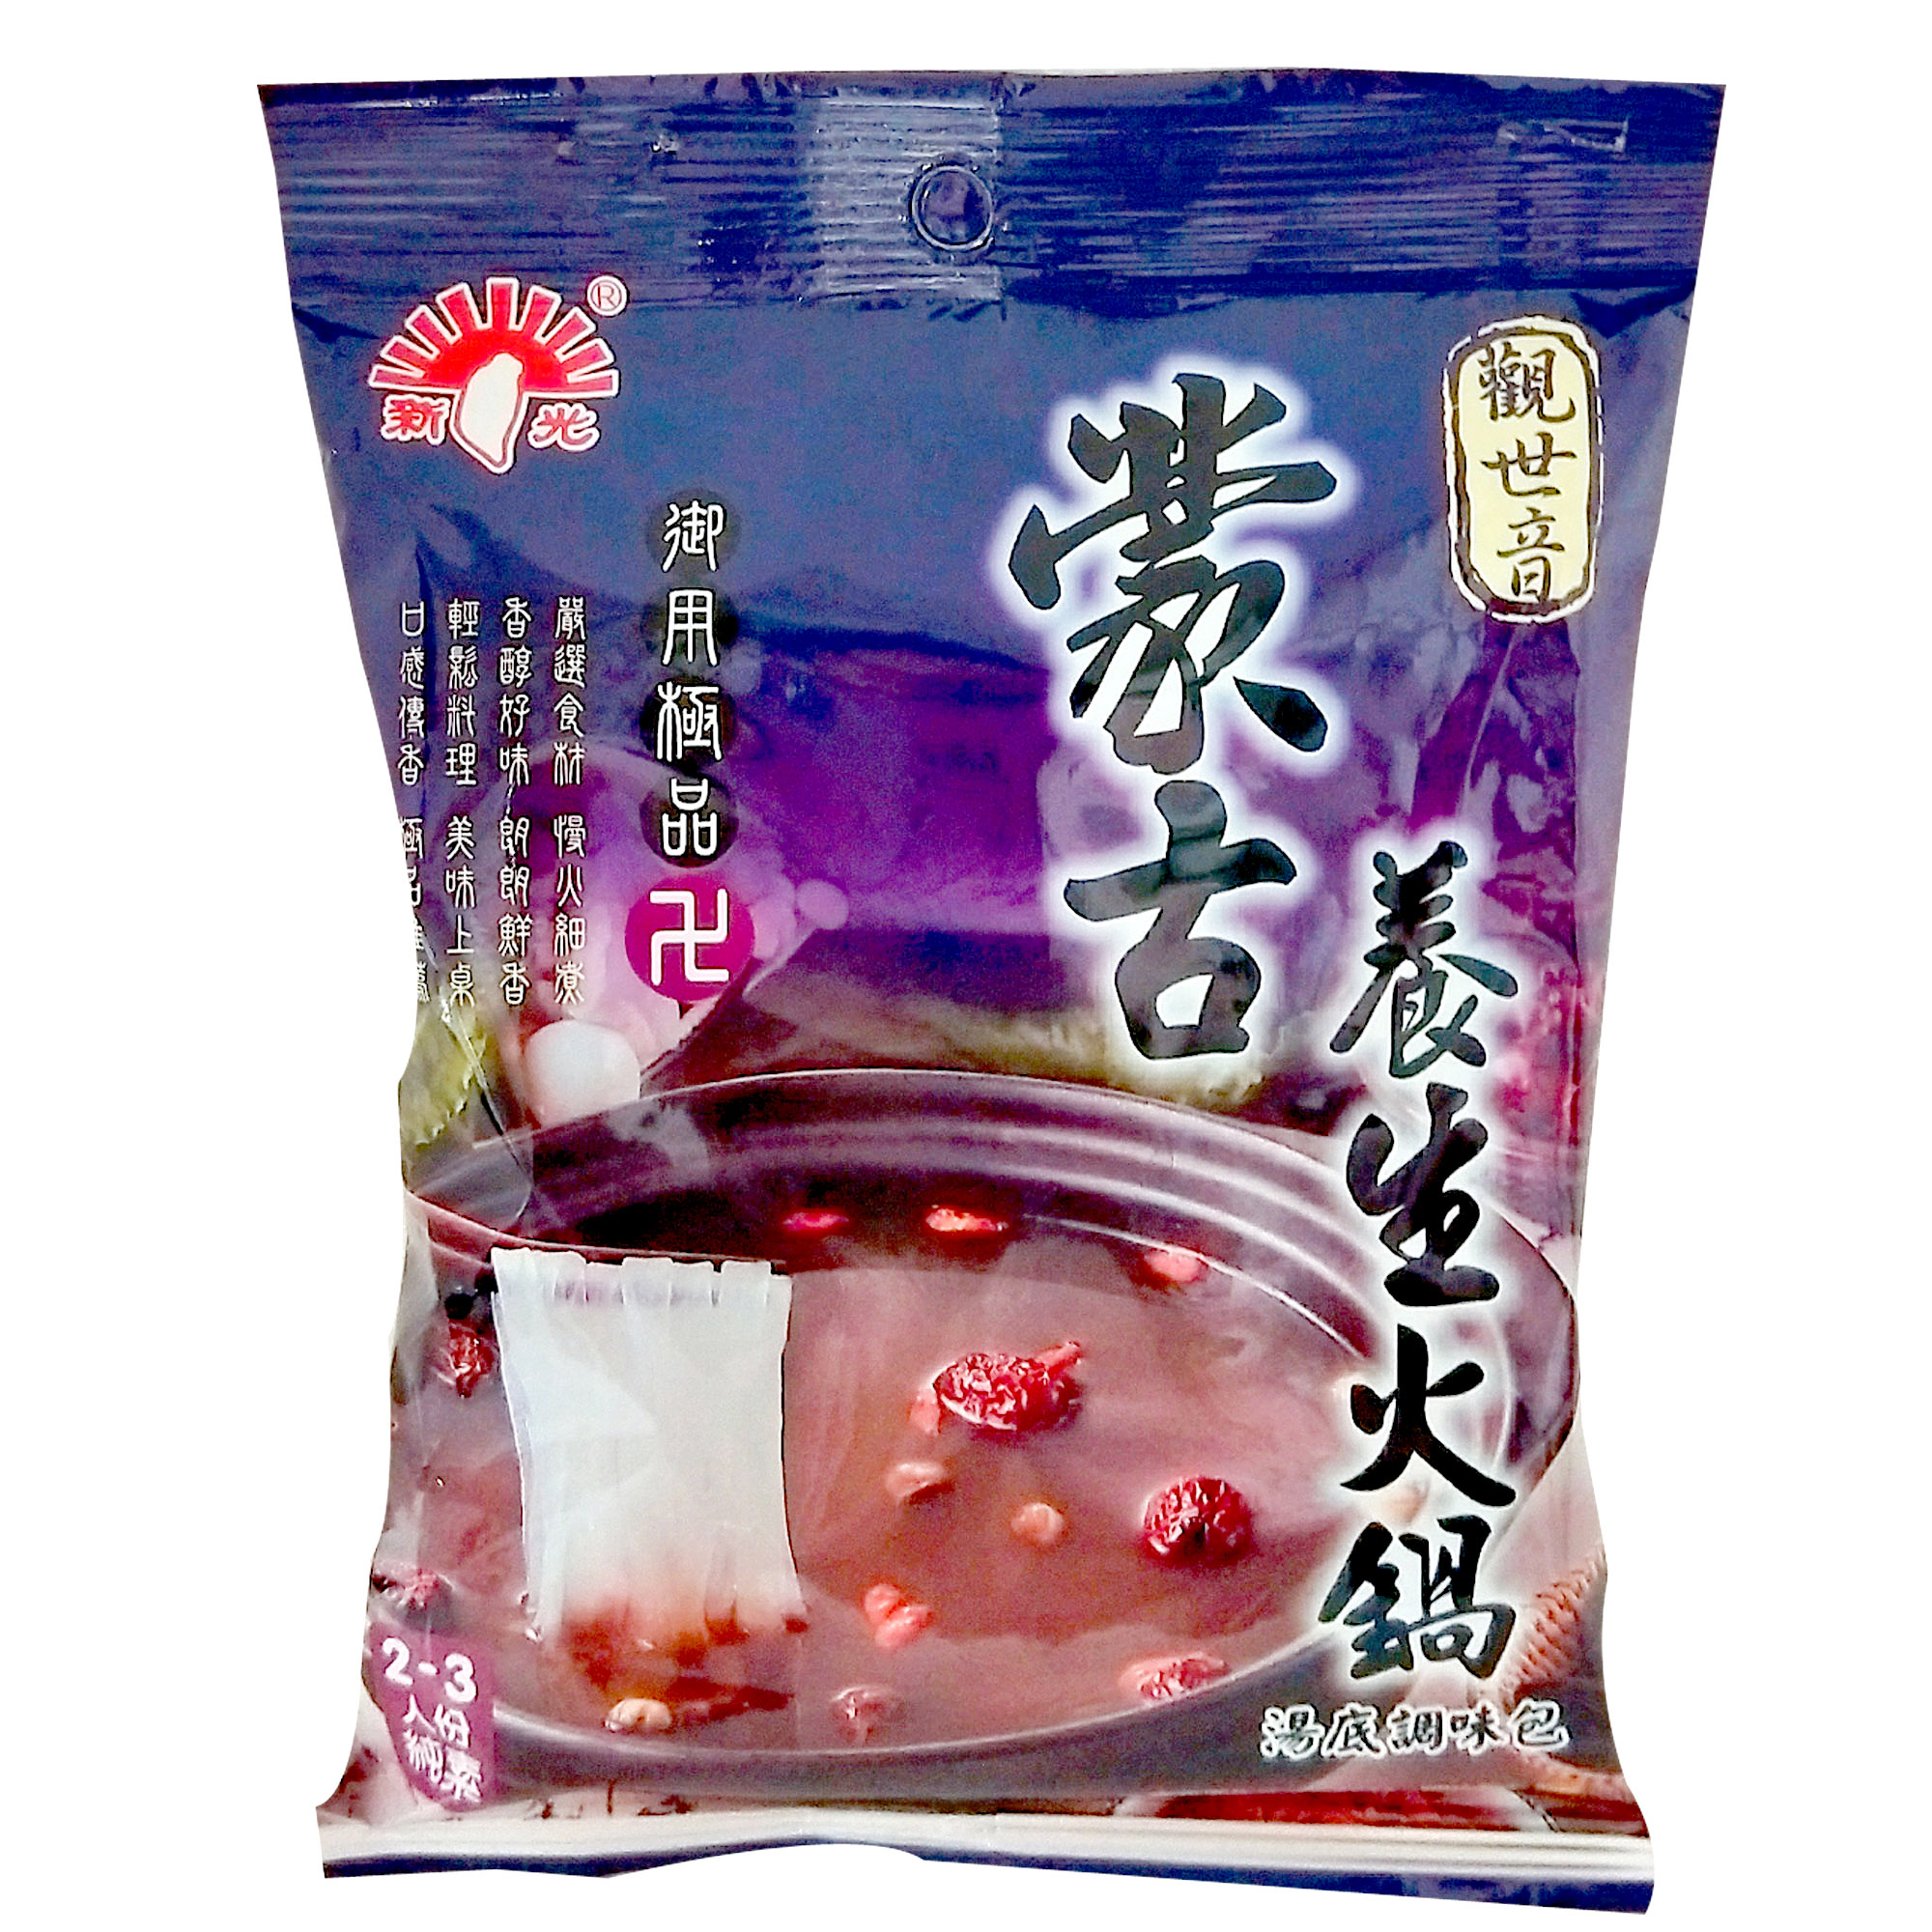 Image hsin kuang Healthy Mongolian Steamboat Soup Base 新光 - 蒙古养生火锅汤底 75grams